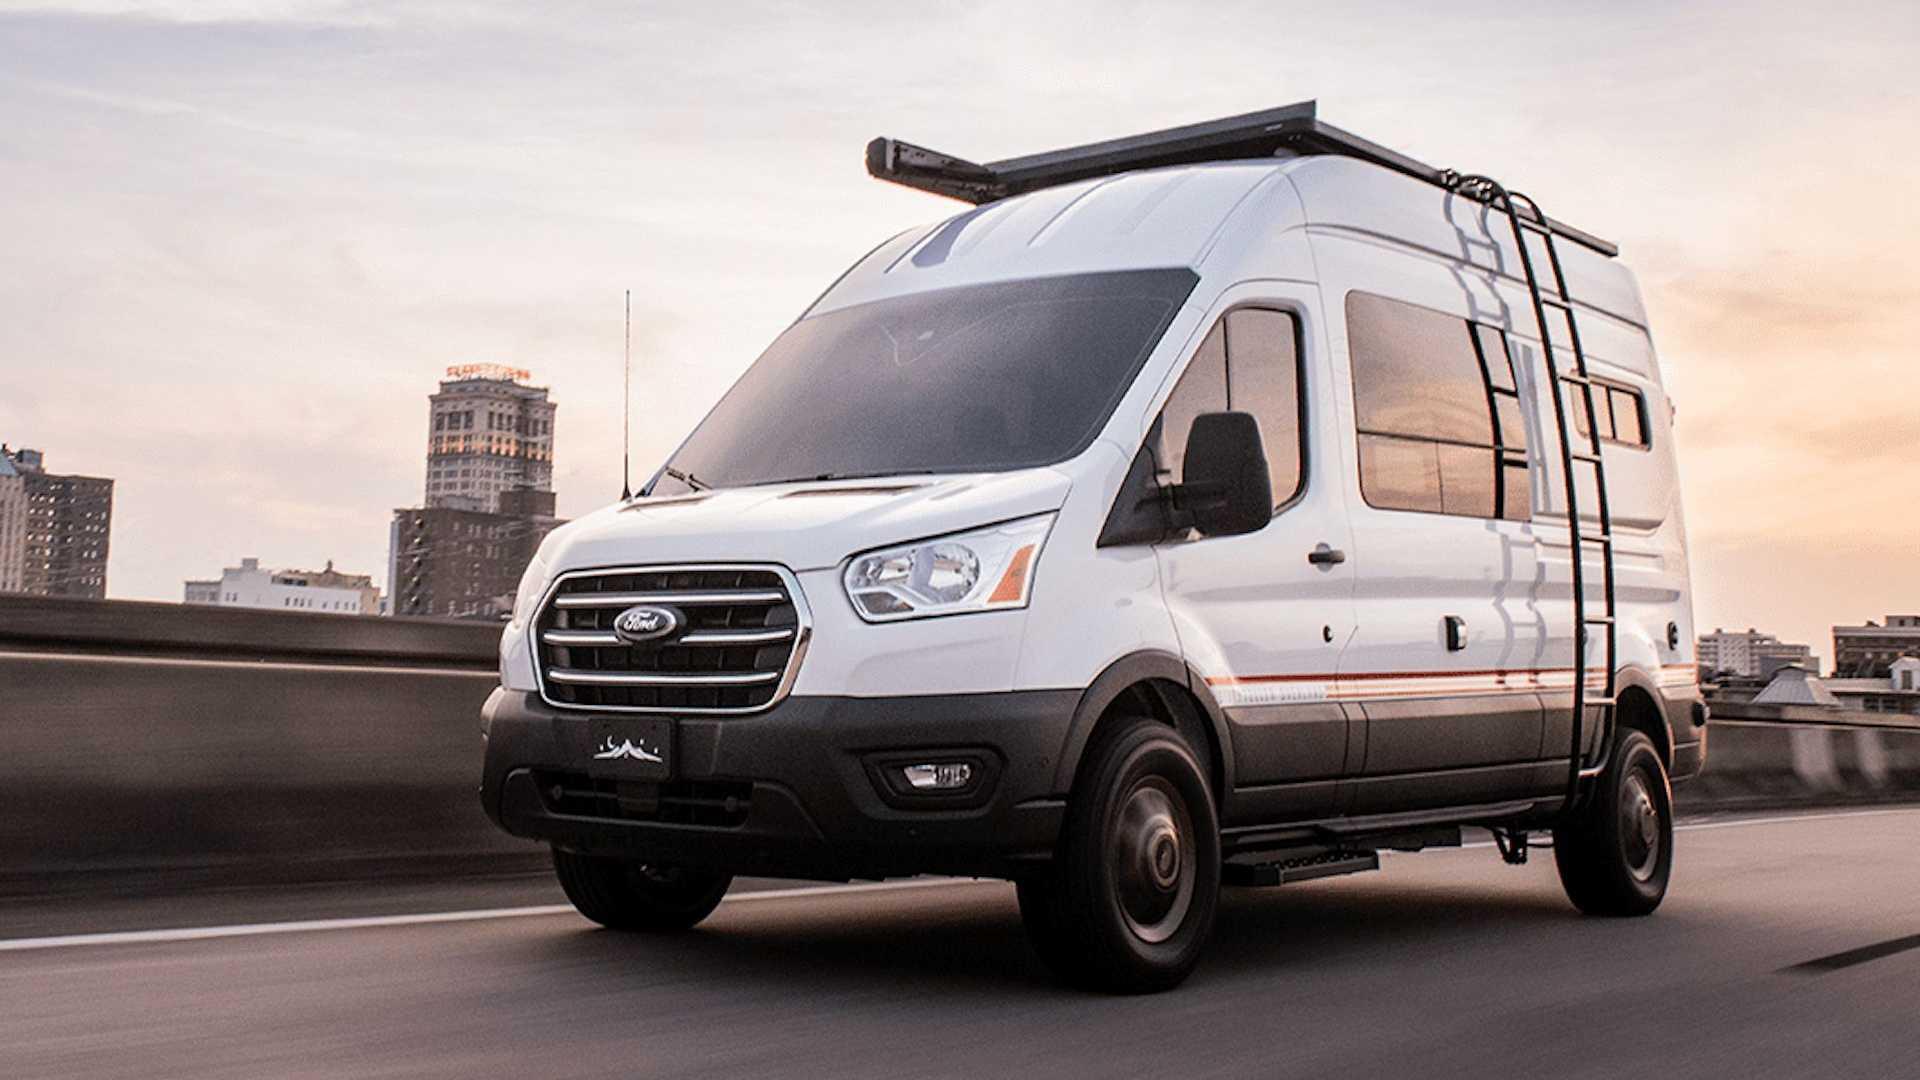 EL Storyteller Overland Ford Transit Mode LT presume de un completo equipamiento